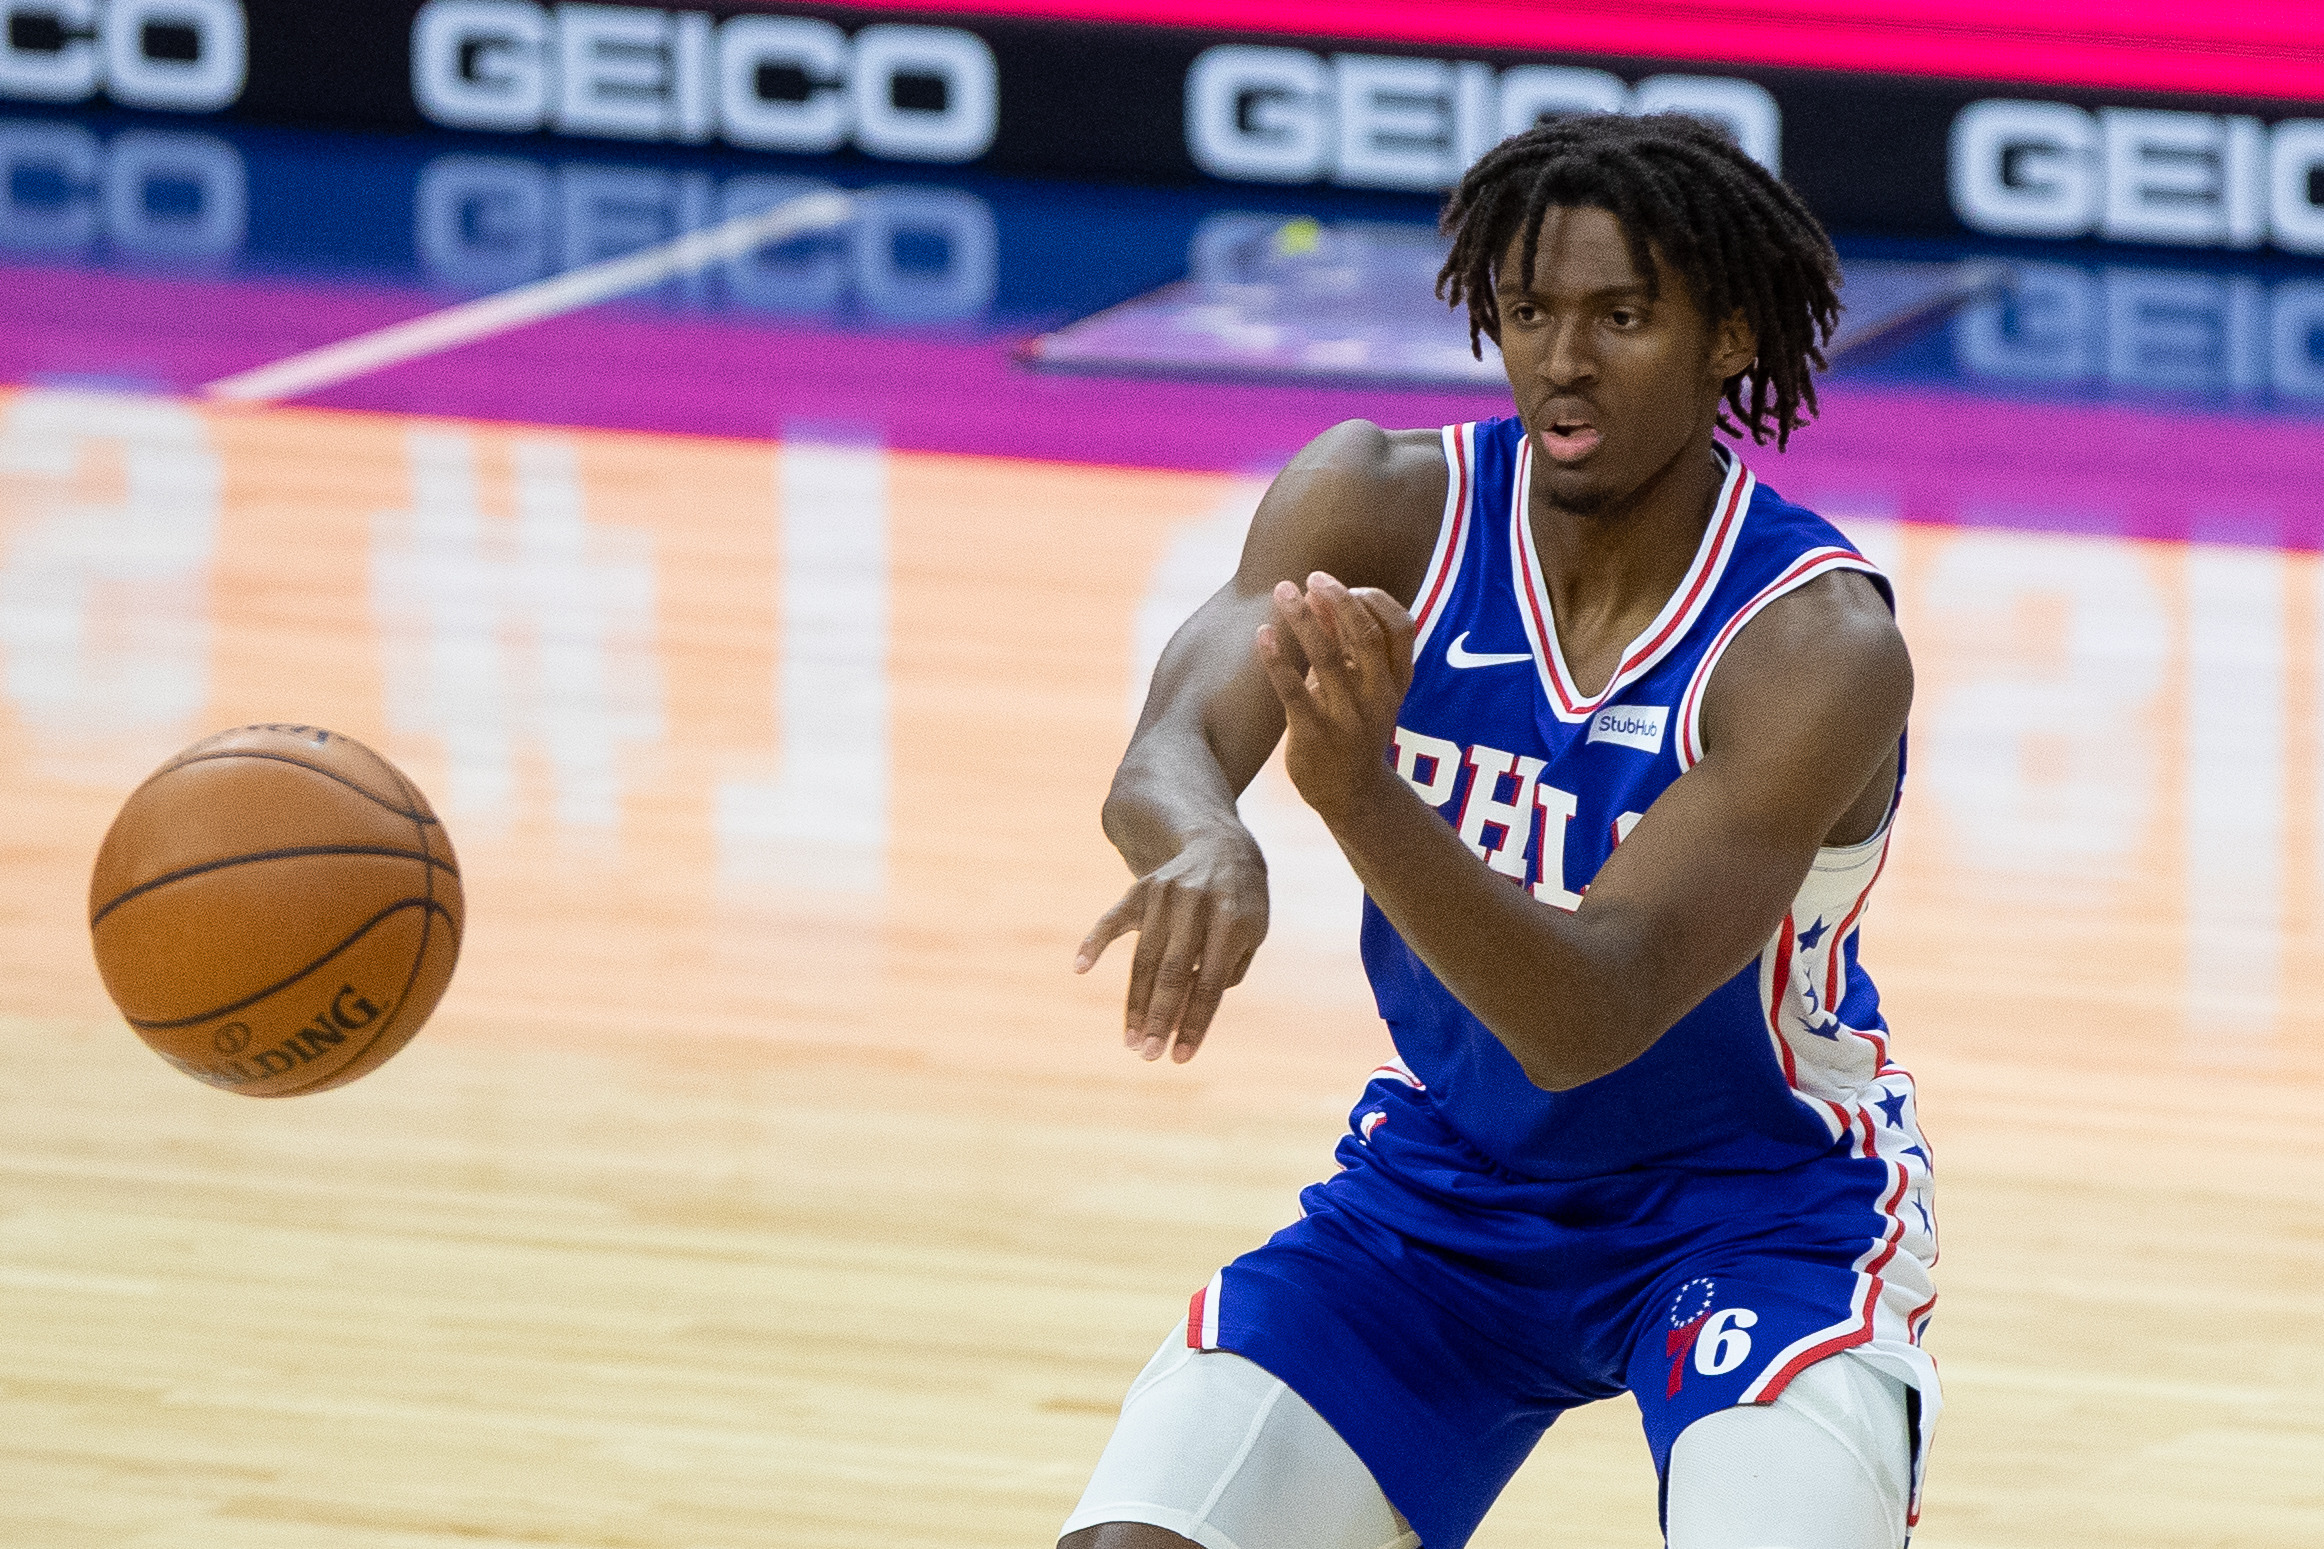 Jan 12, 2021; Philadelphia, Pennsylvania, USA; Philadelphia 76ers guard Tyrese Maxey (0) passes the ball against the Miami Heat during the third quarter at Wells Fargo Center.